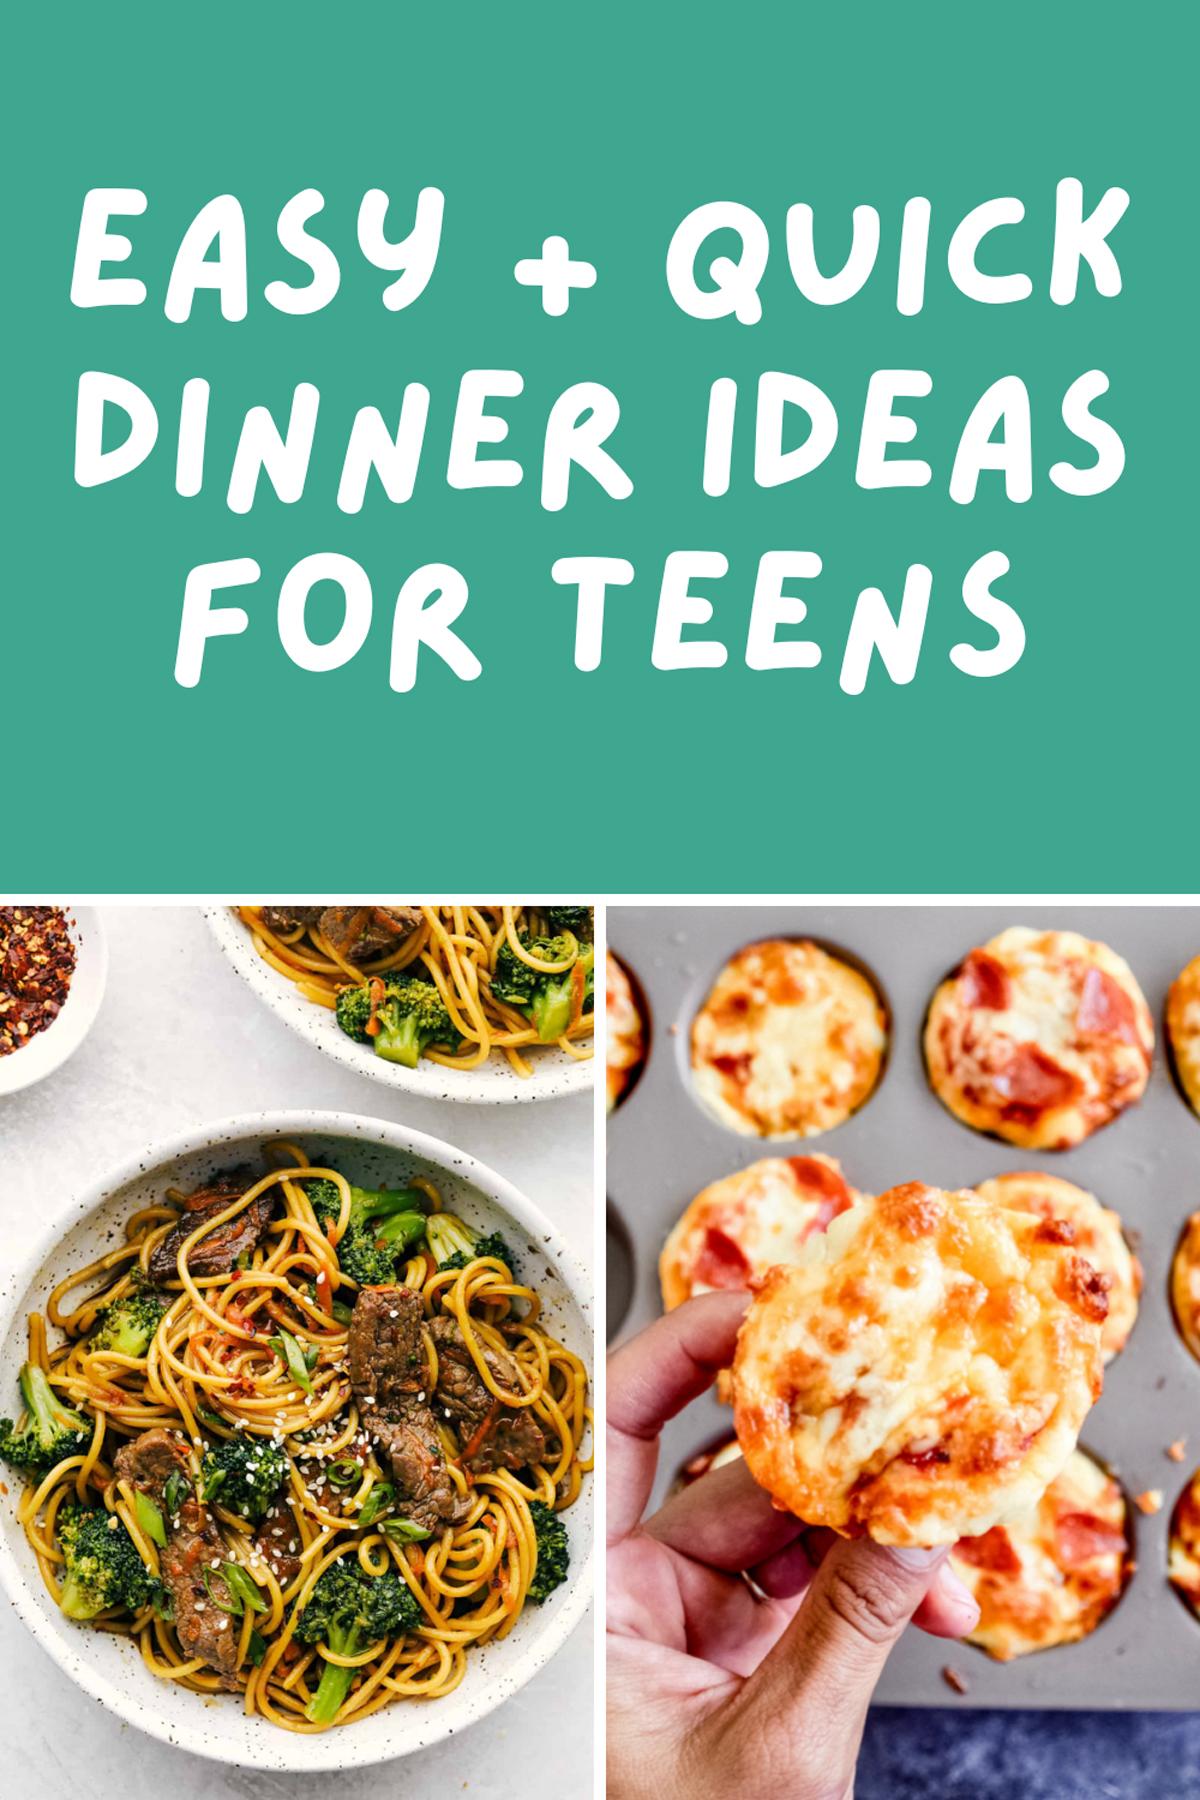 Quick Dinner Ideas for Teens